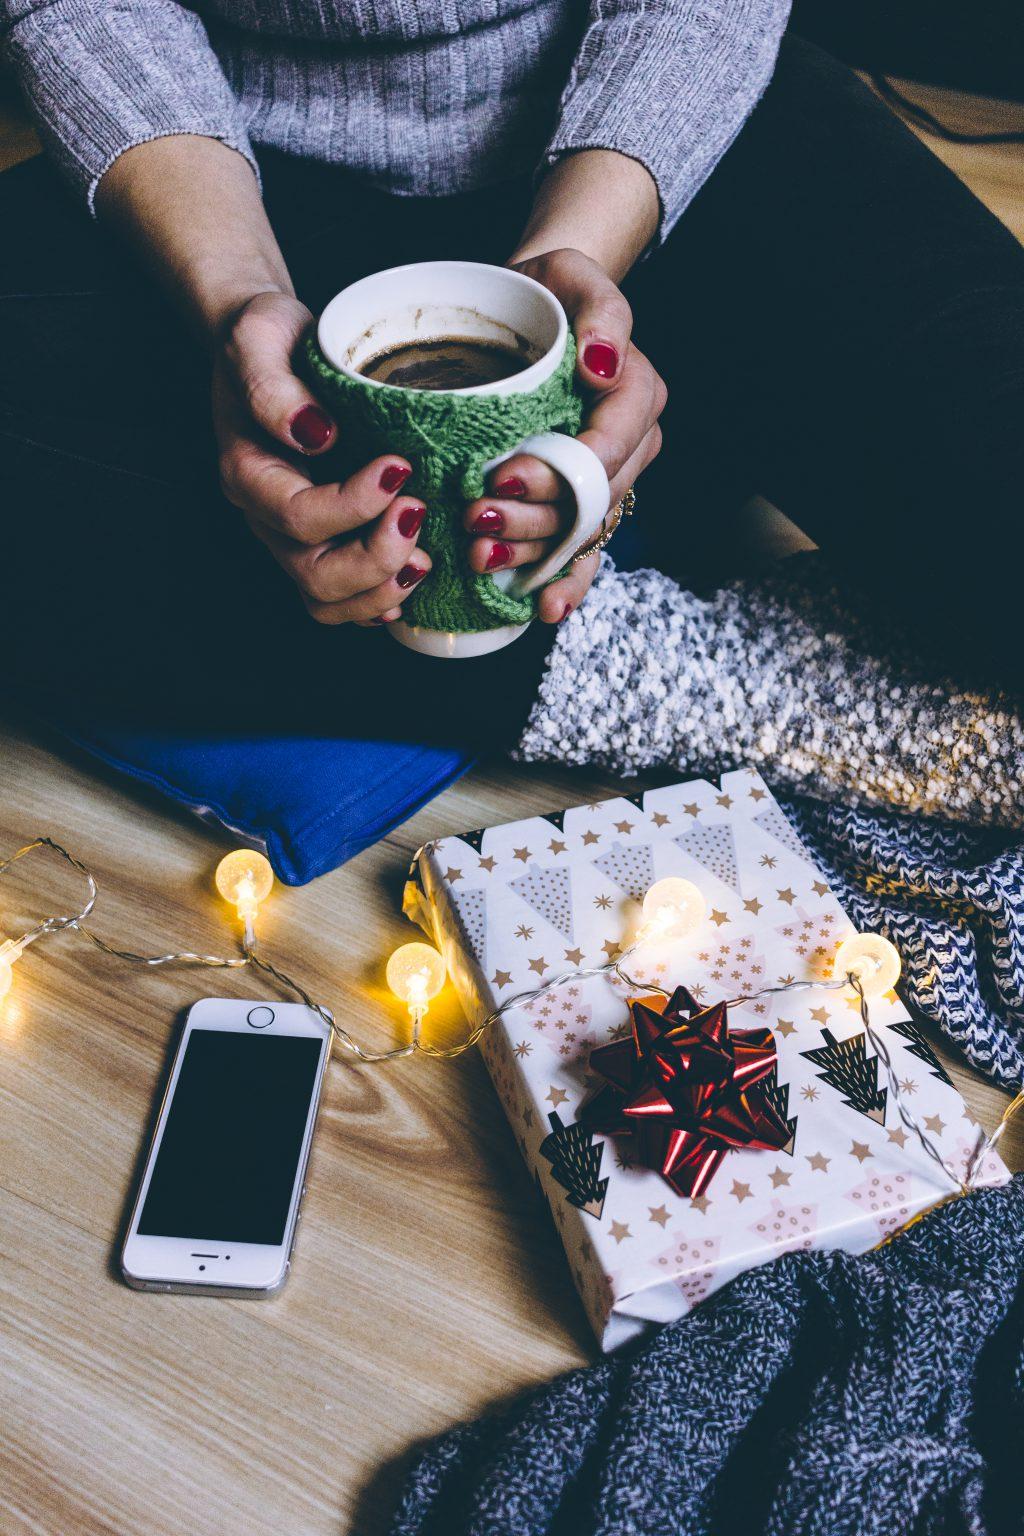 A female holding a mug in a festive setting 2 - free stock photo